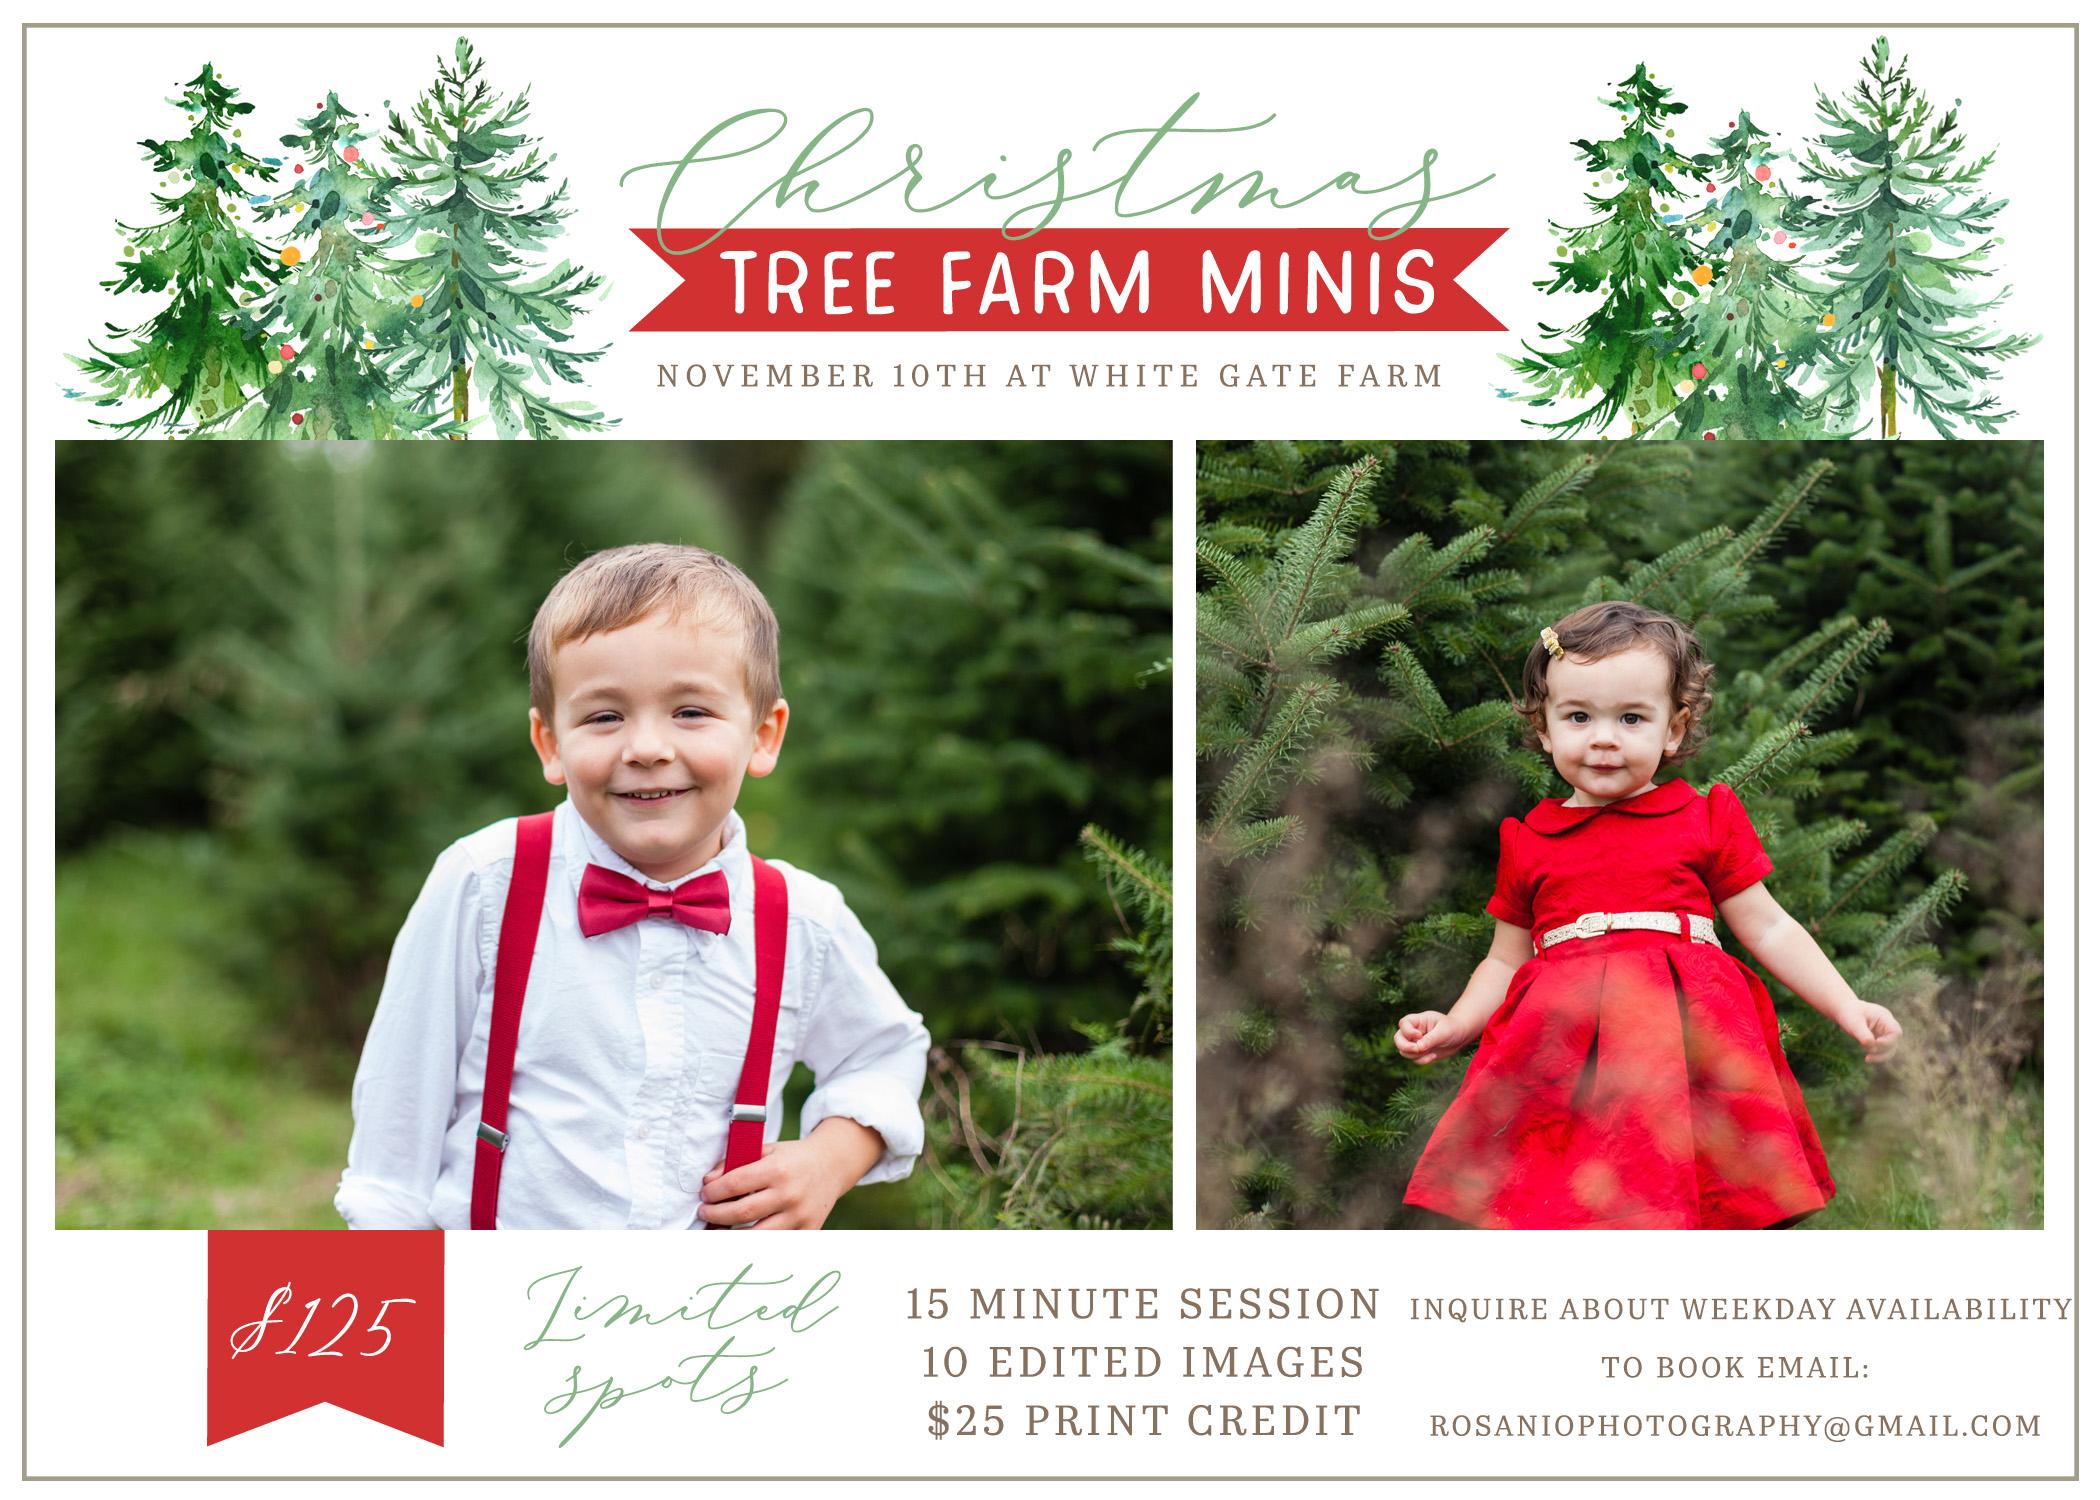 Christmas Tree Farm Mini Sessions Massachusetts And New Hampshire Family Photographer White Gate Christmas Tree Farm West Newbury Ma Rosanio Photography